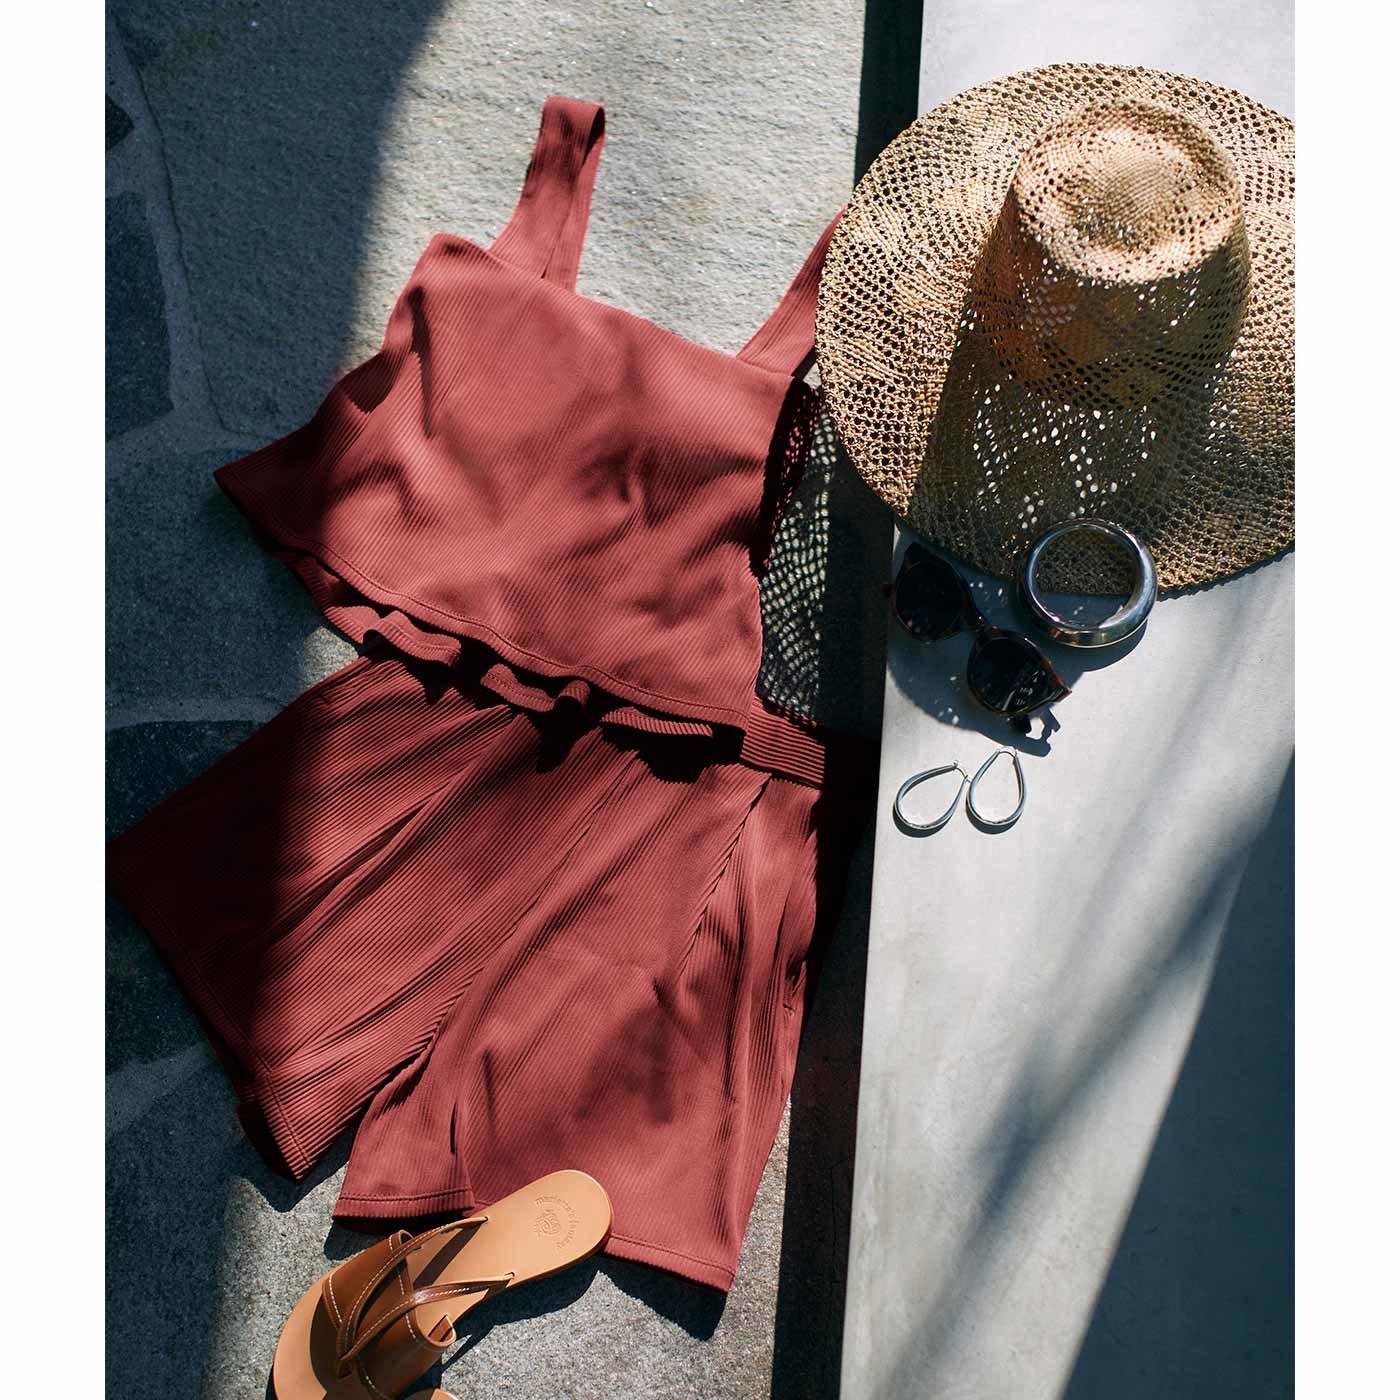 IEDIT[イディット] 福田麻琴さんコラボ まるで服みたいなスイムウェア〈ブリックブラウン〉